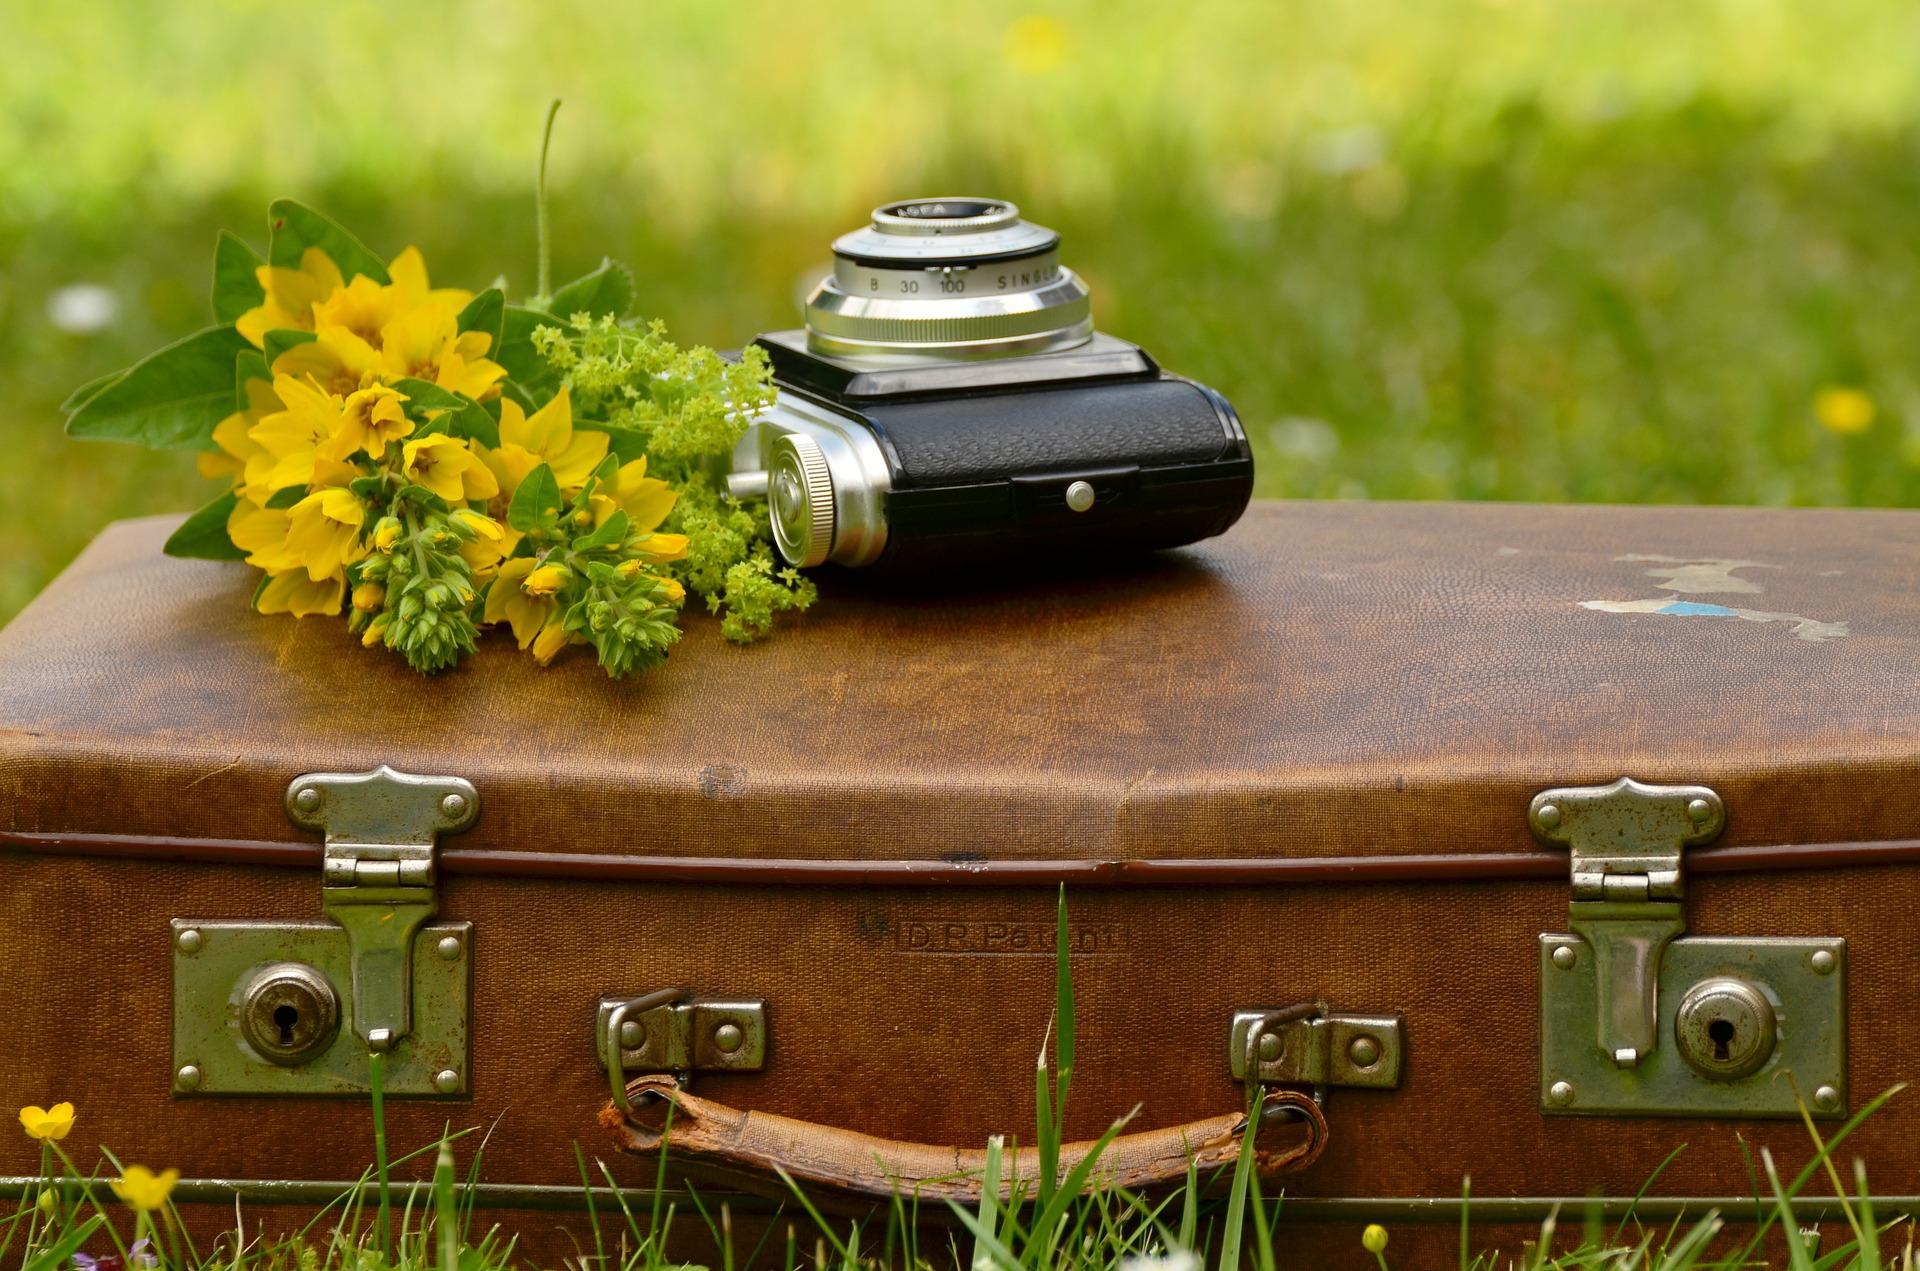 luggage-1482618_1920.jpg